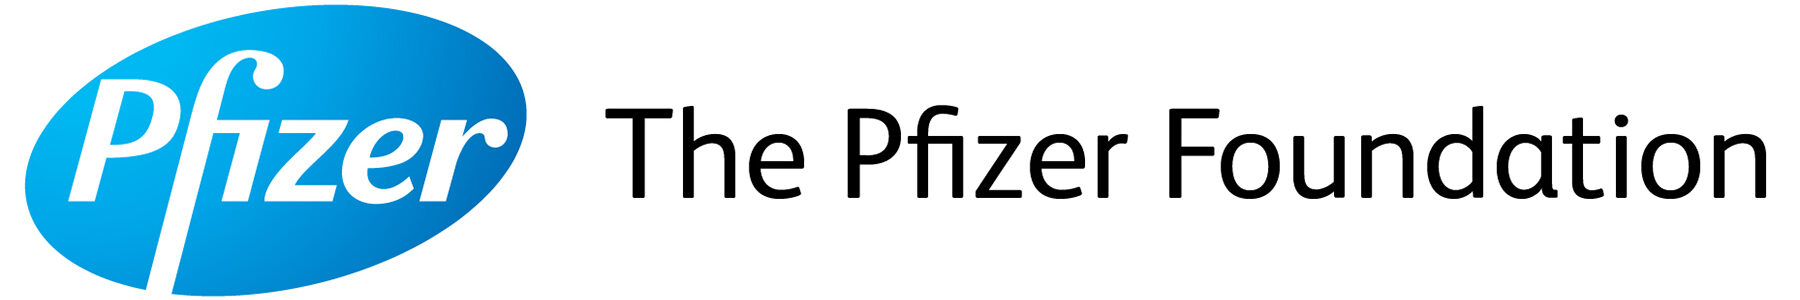 The Pfizer Foundation Logo